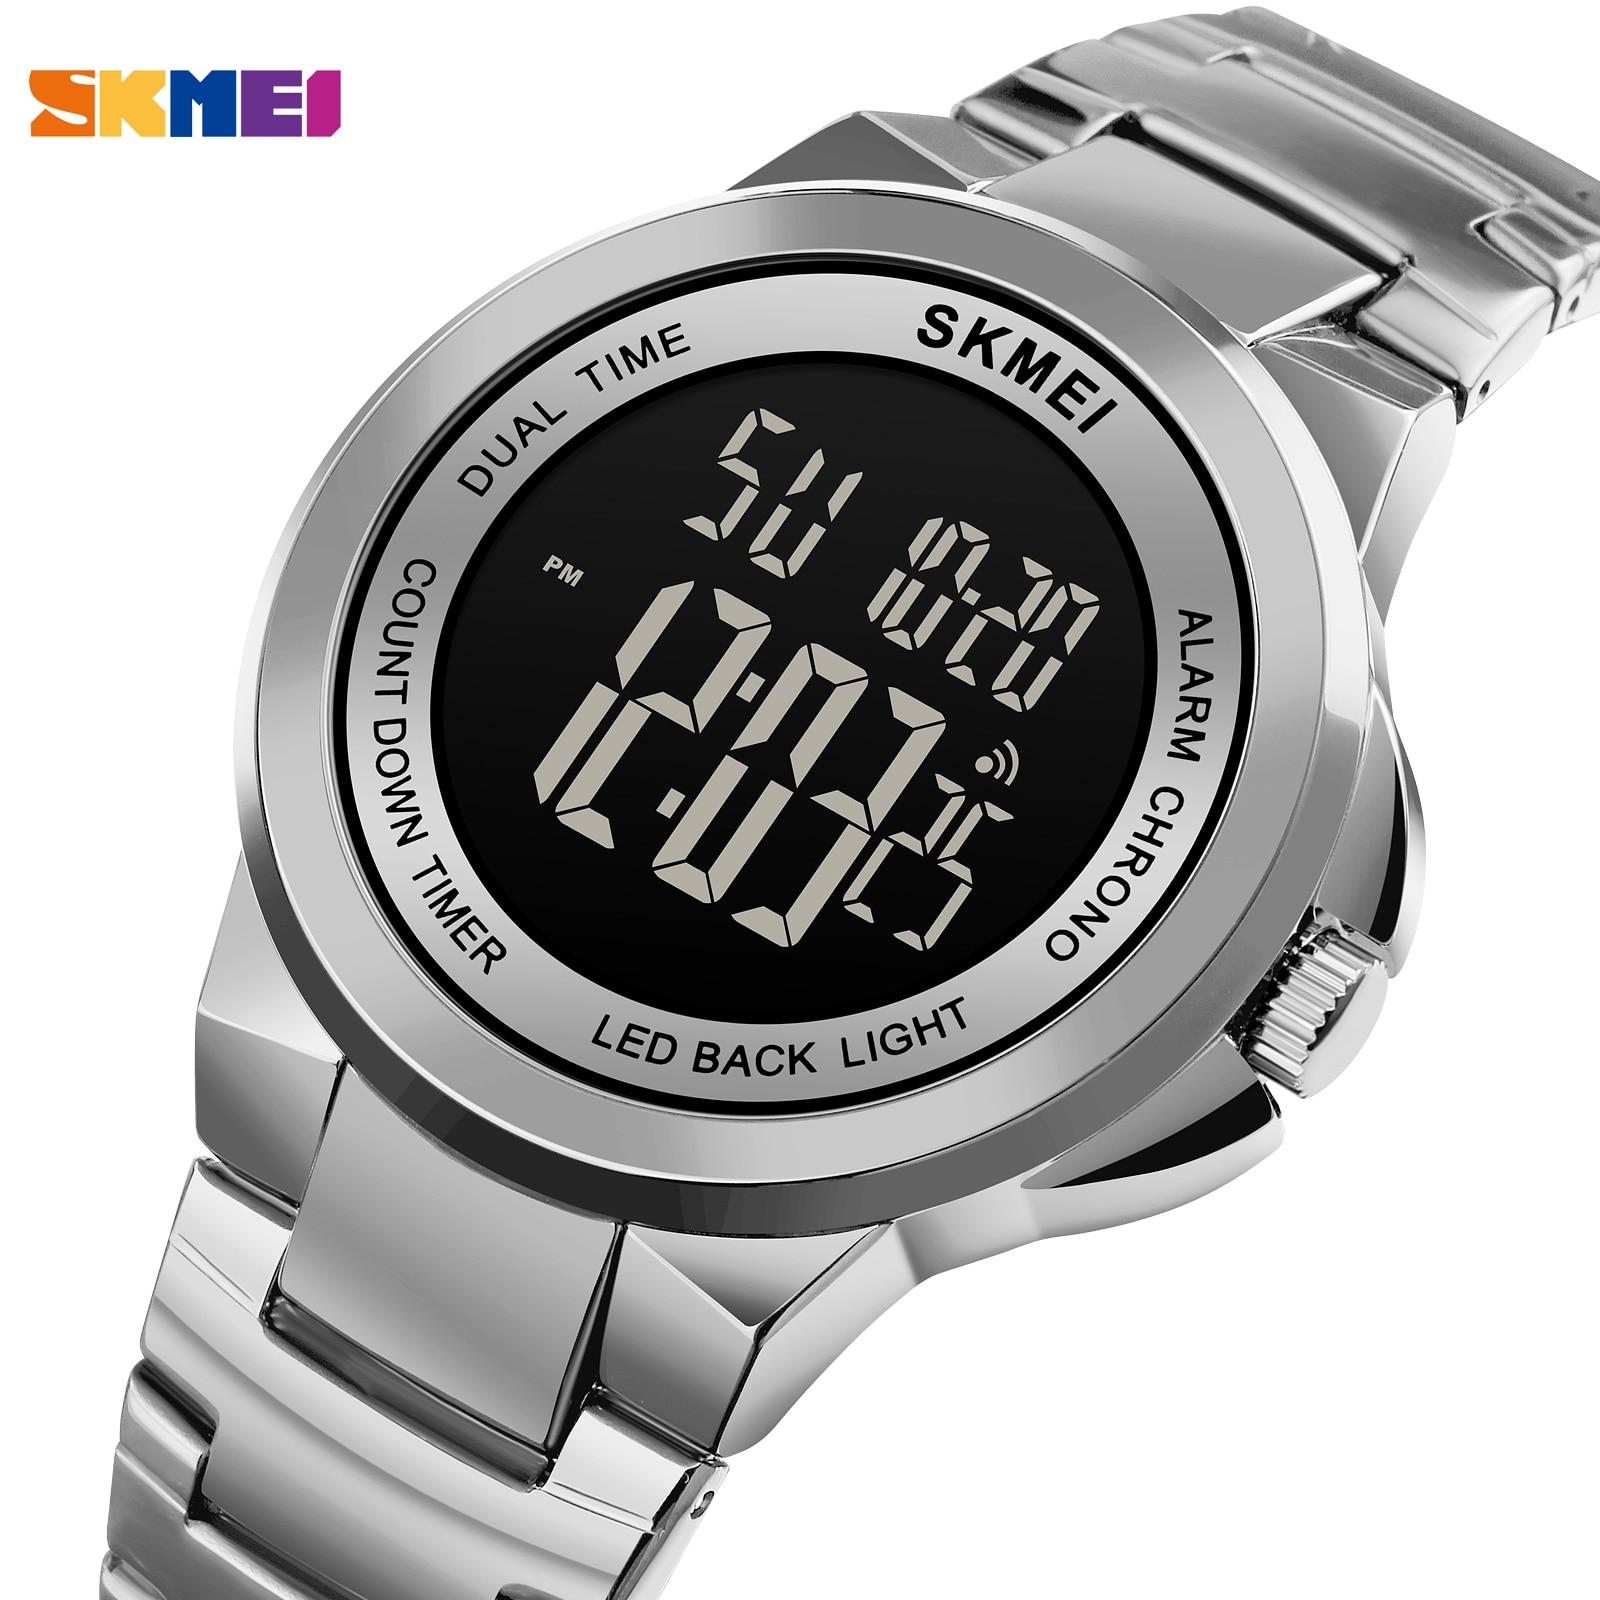 SKMEI Brand Men Digital Watches Fashion Chrono Countdown Electronic Clock Luxury Stainless Steel Men's Stopwatch Masculino 1712